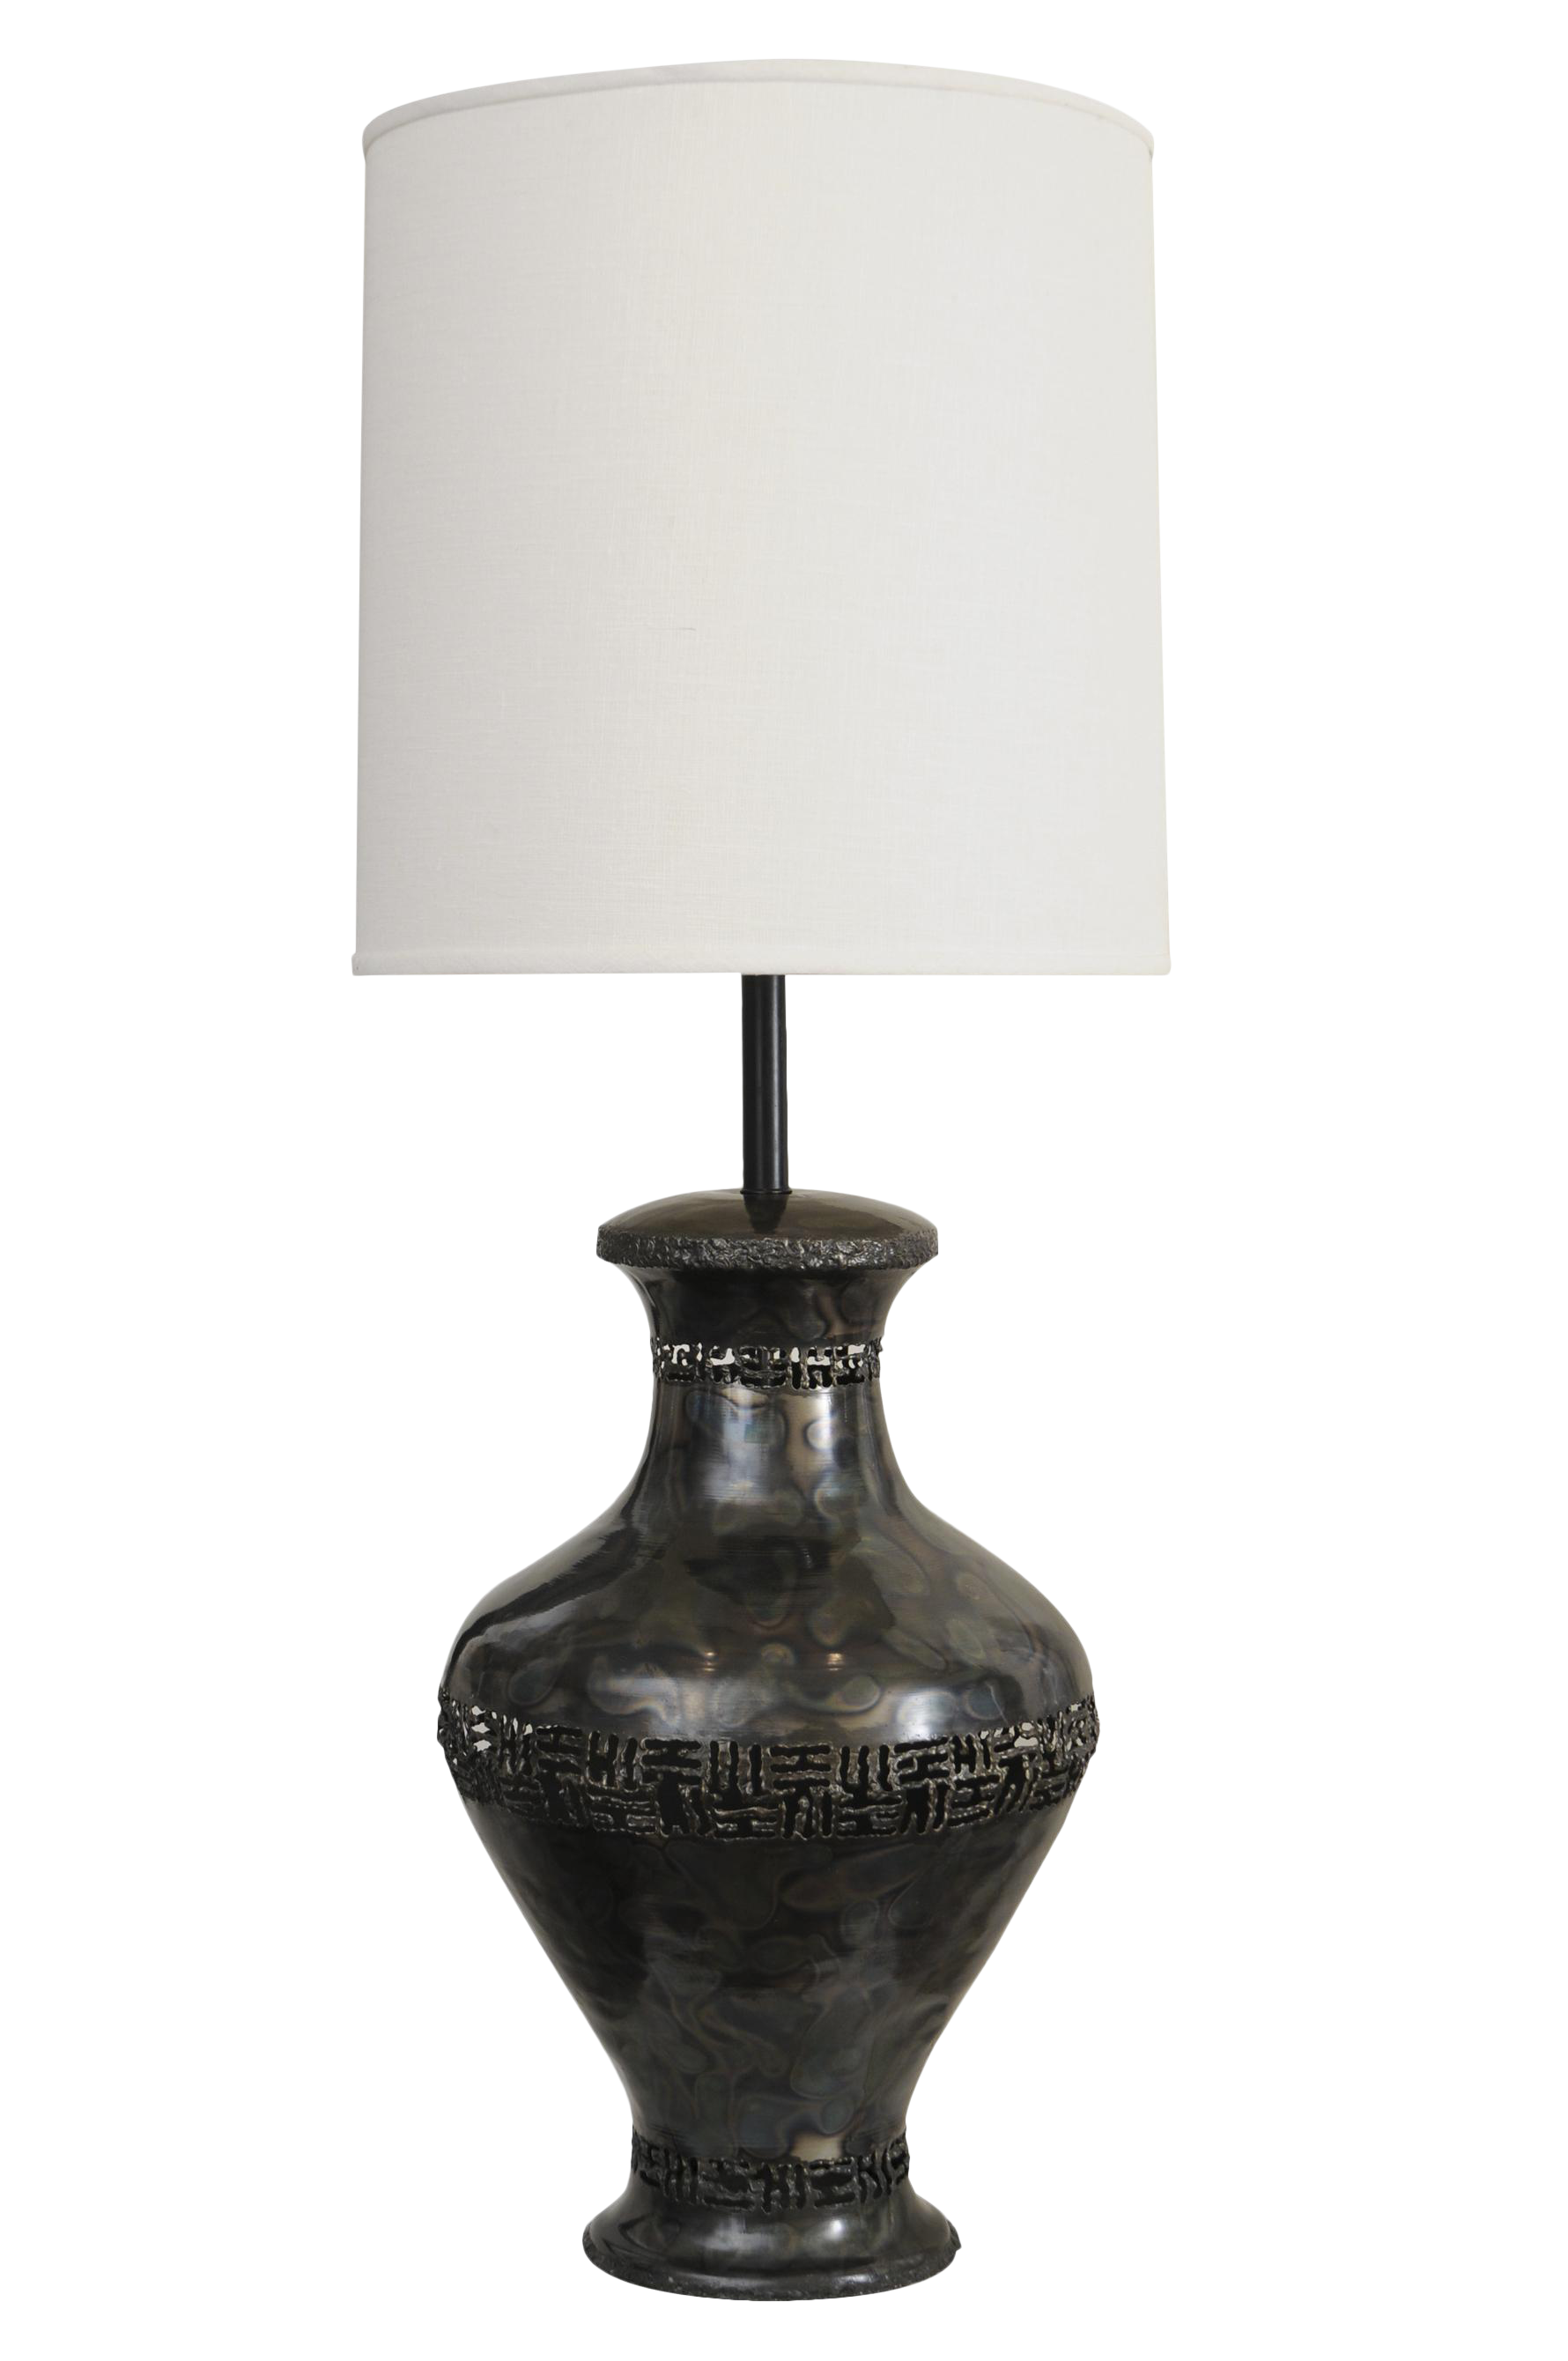 Mid Century Italian Signed Marcello Fantoni Sculptural Brutalist Table Lamp